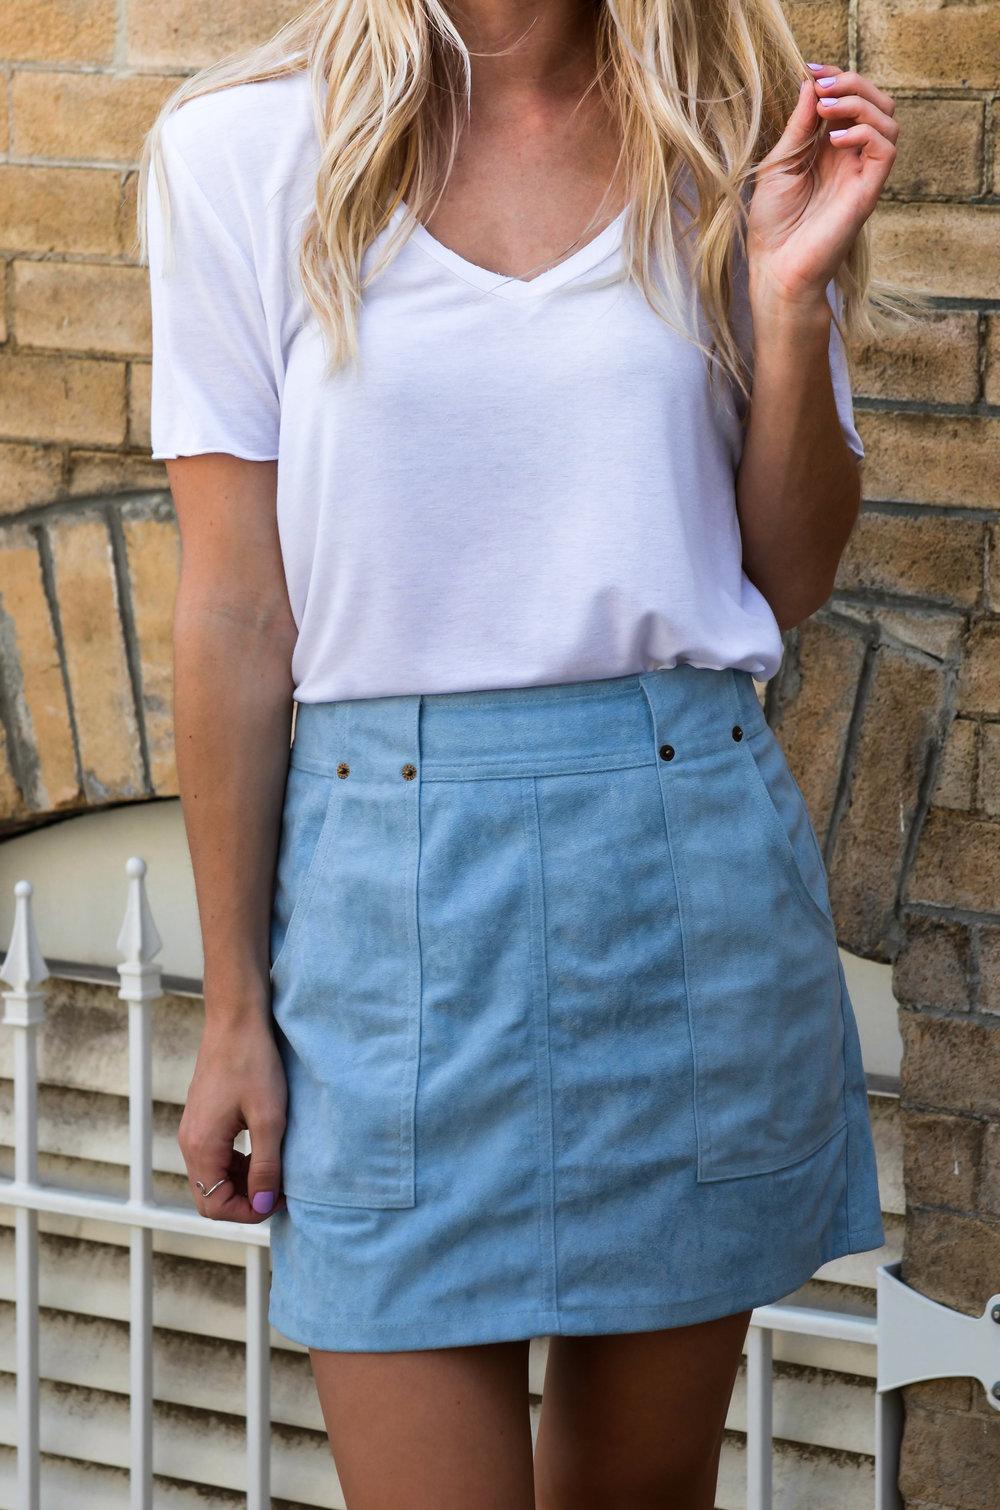 secondBaby Blue Skirt-10.jpg